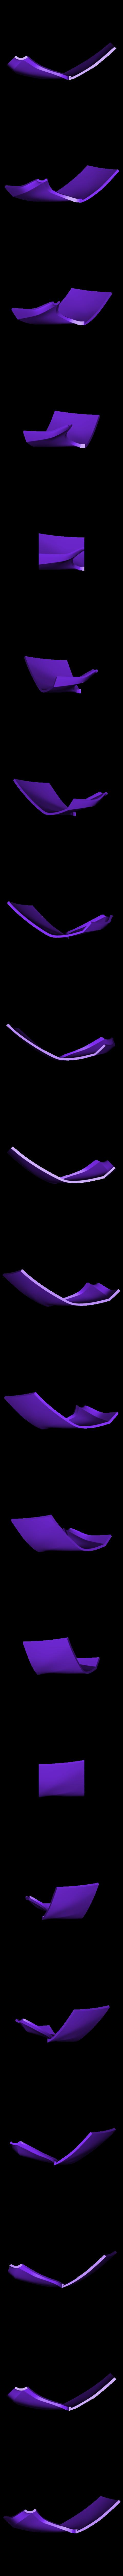 Part_9.stl Download free STL file Red Hood Helmet (Batman) • 3D printer object, VillainousPropShop